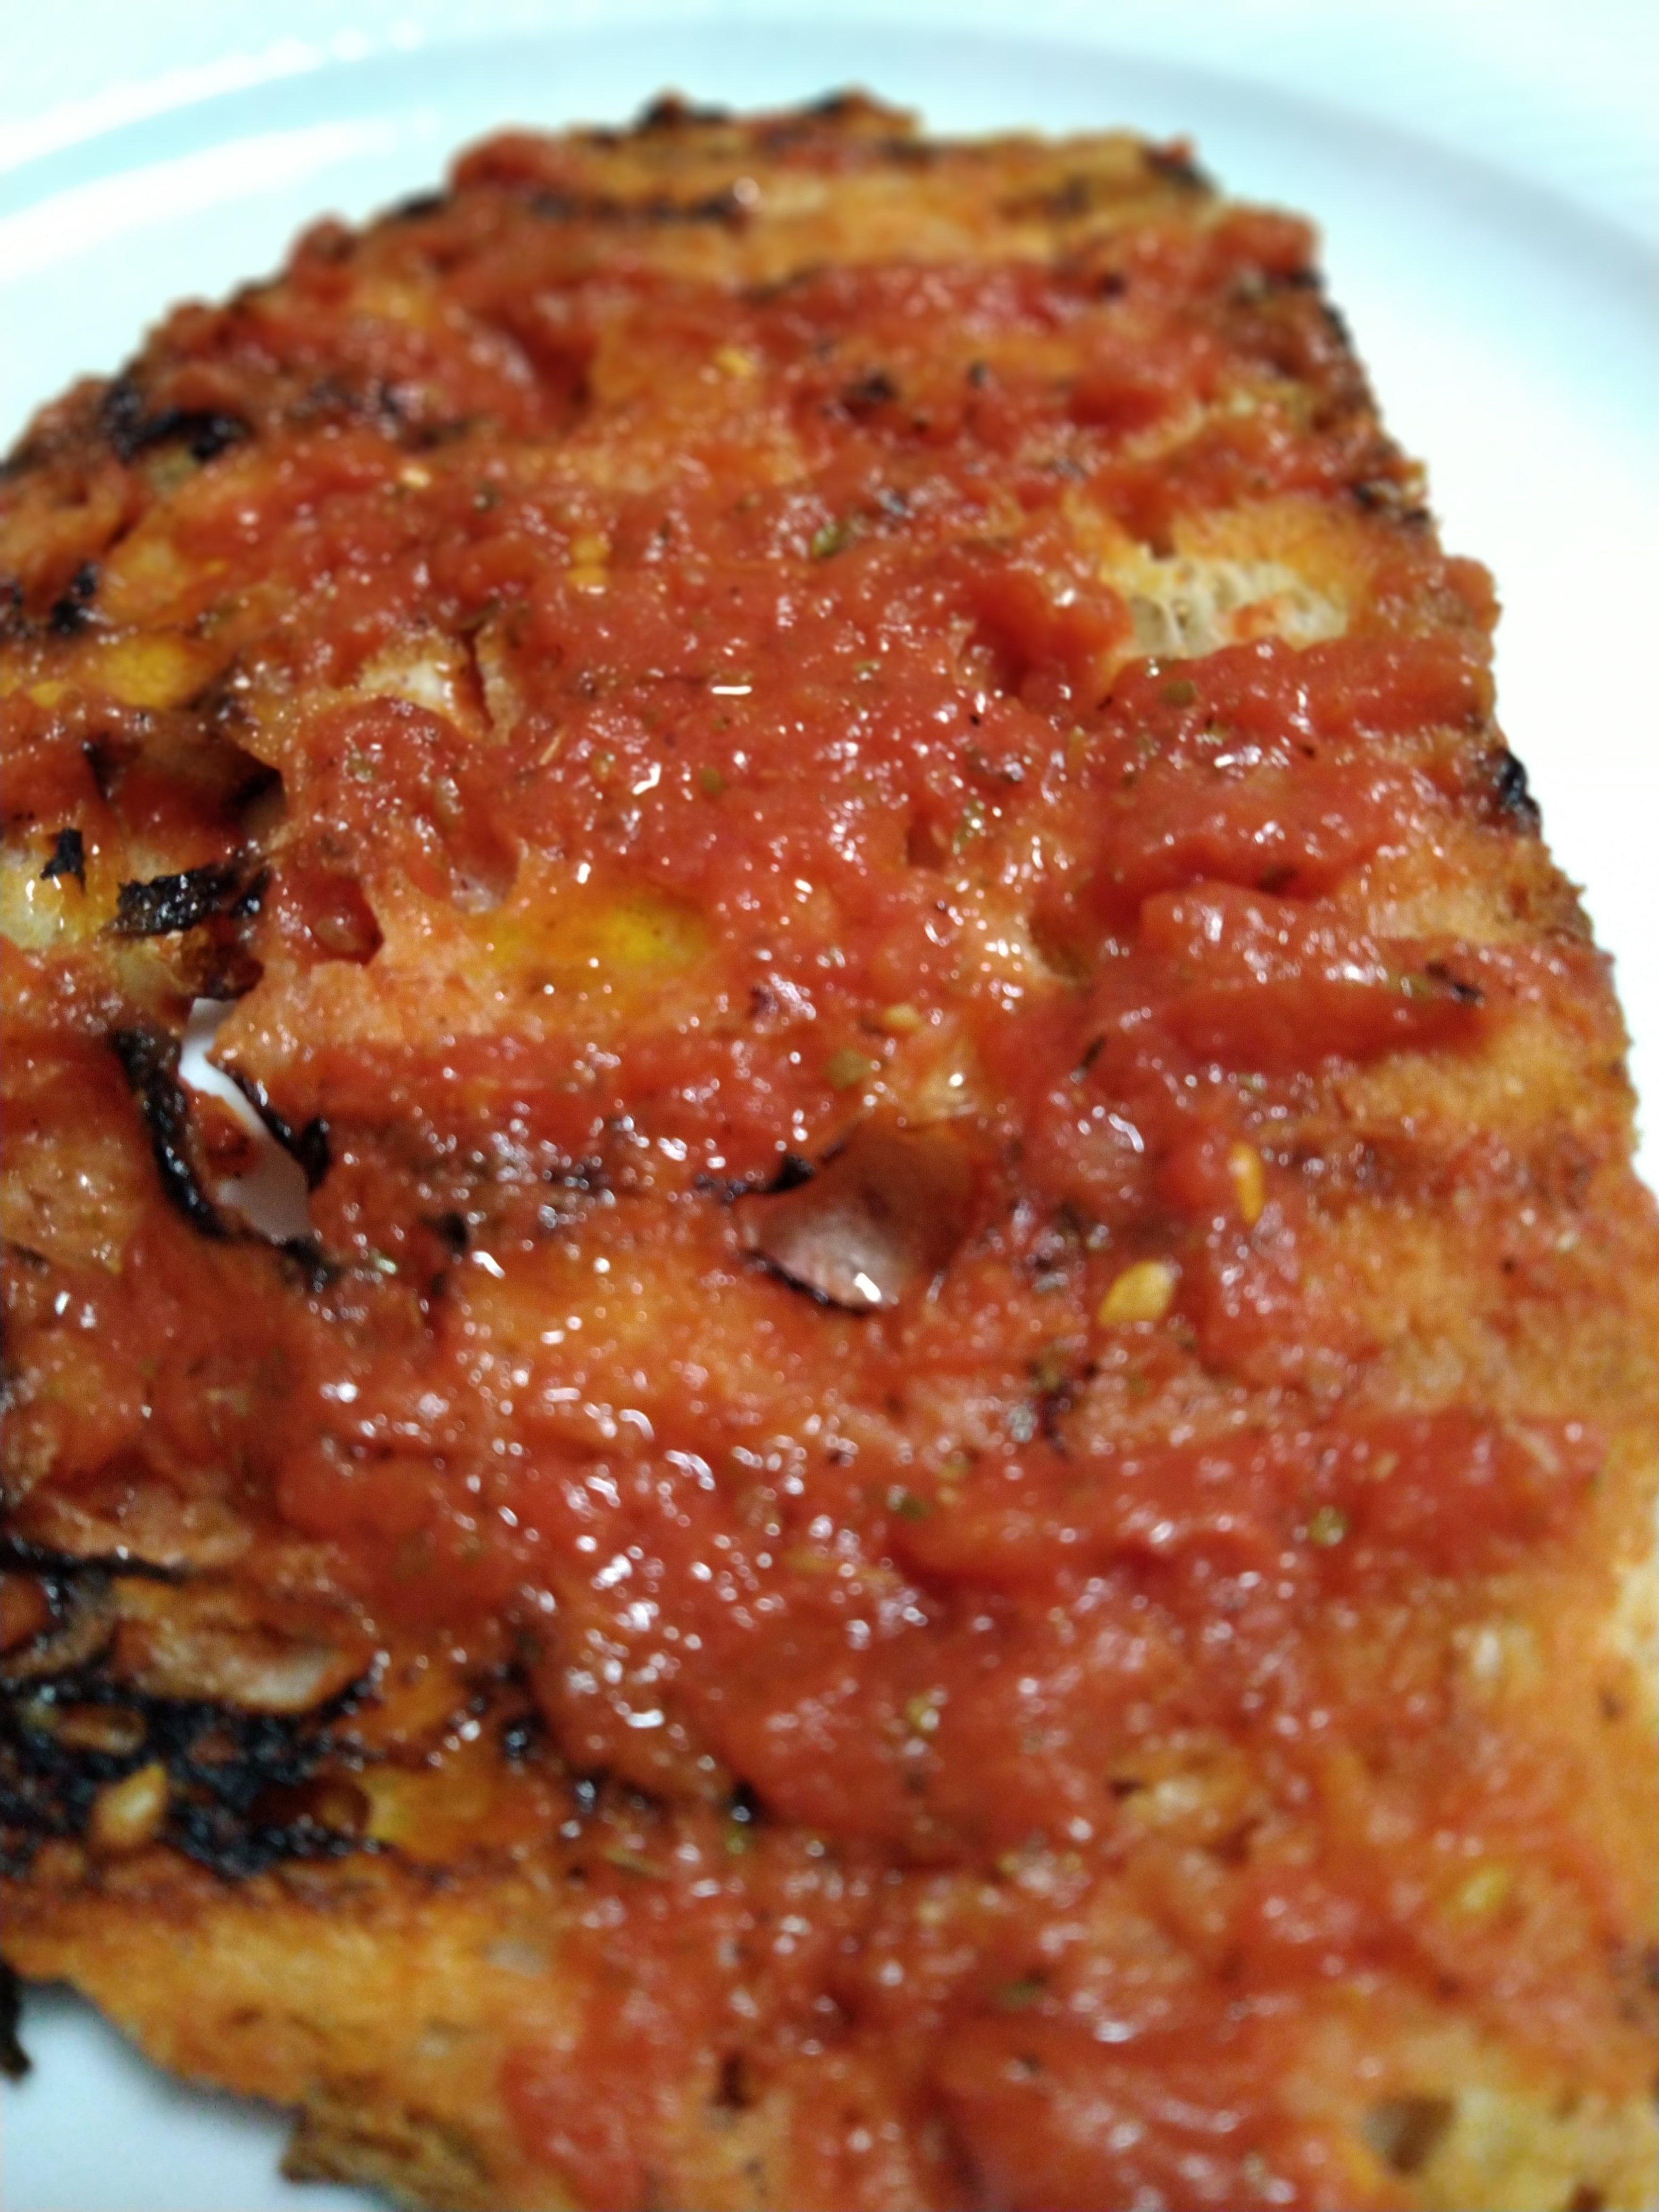 Bruschetta alla Pizzaiola